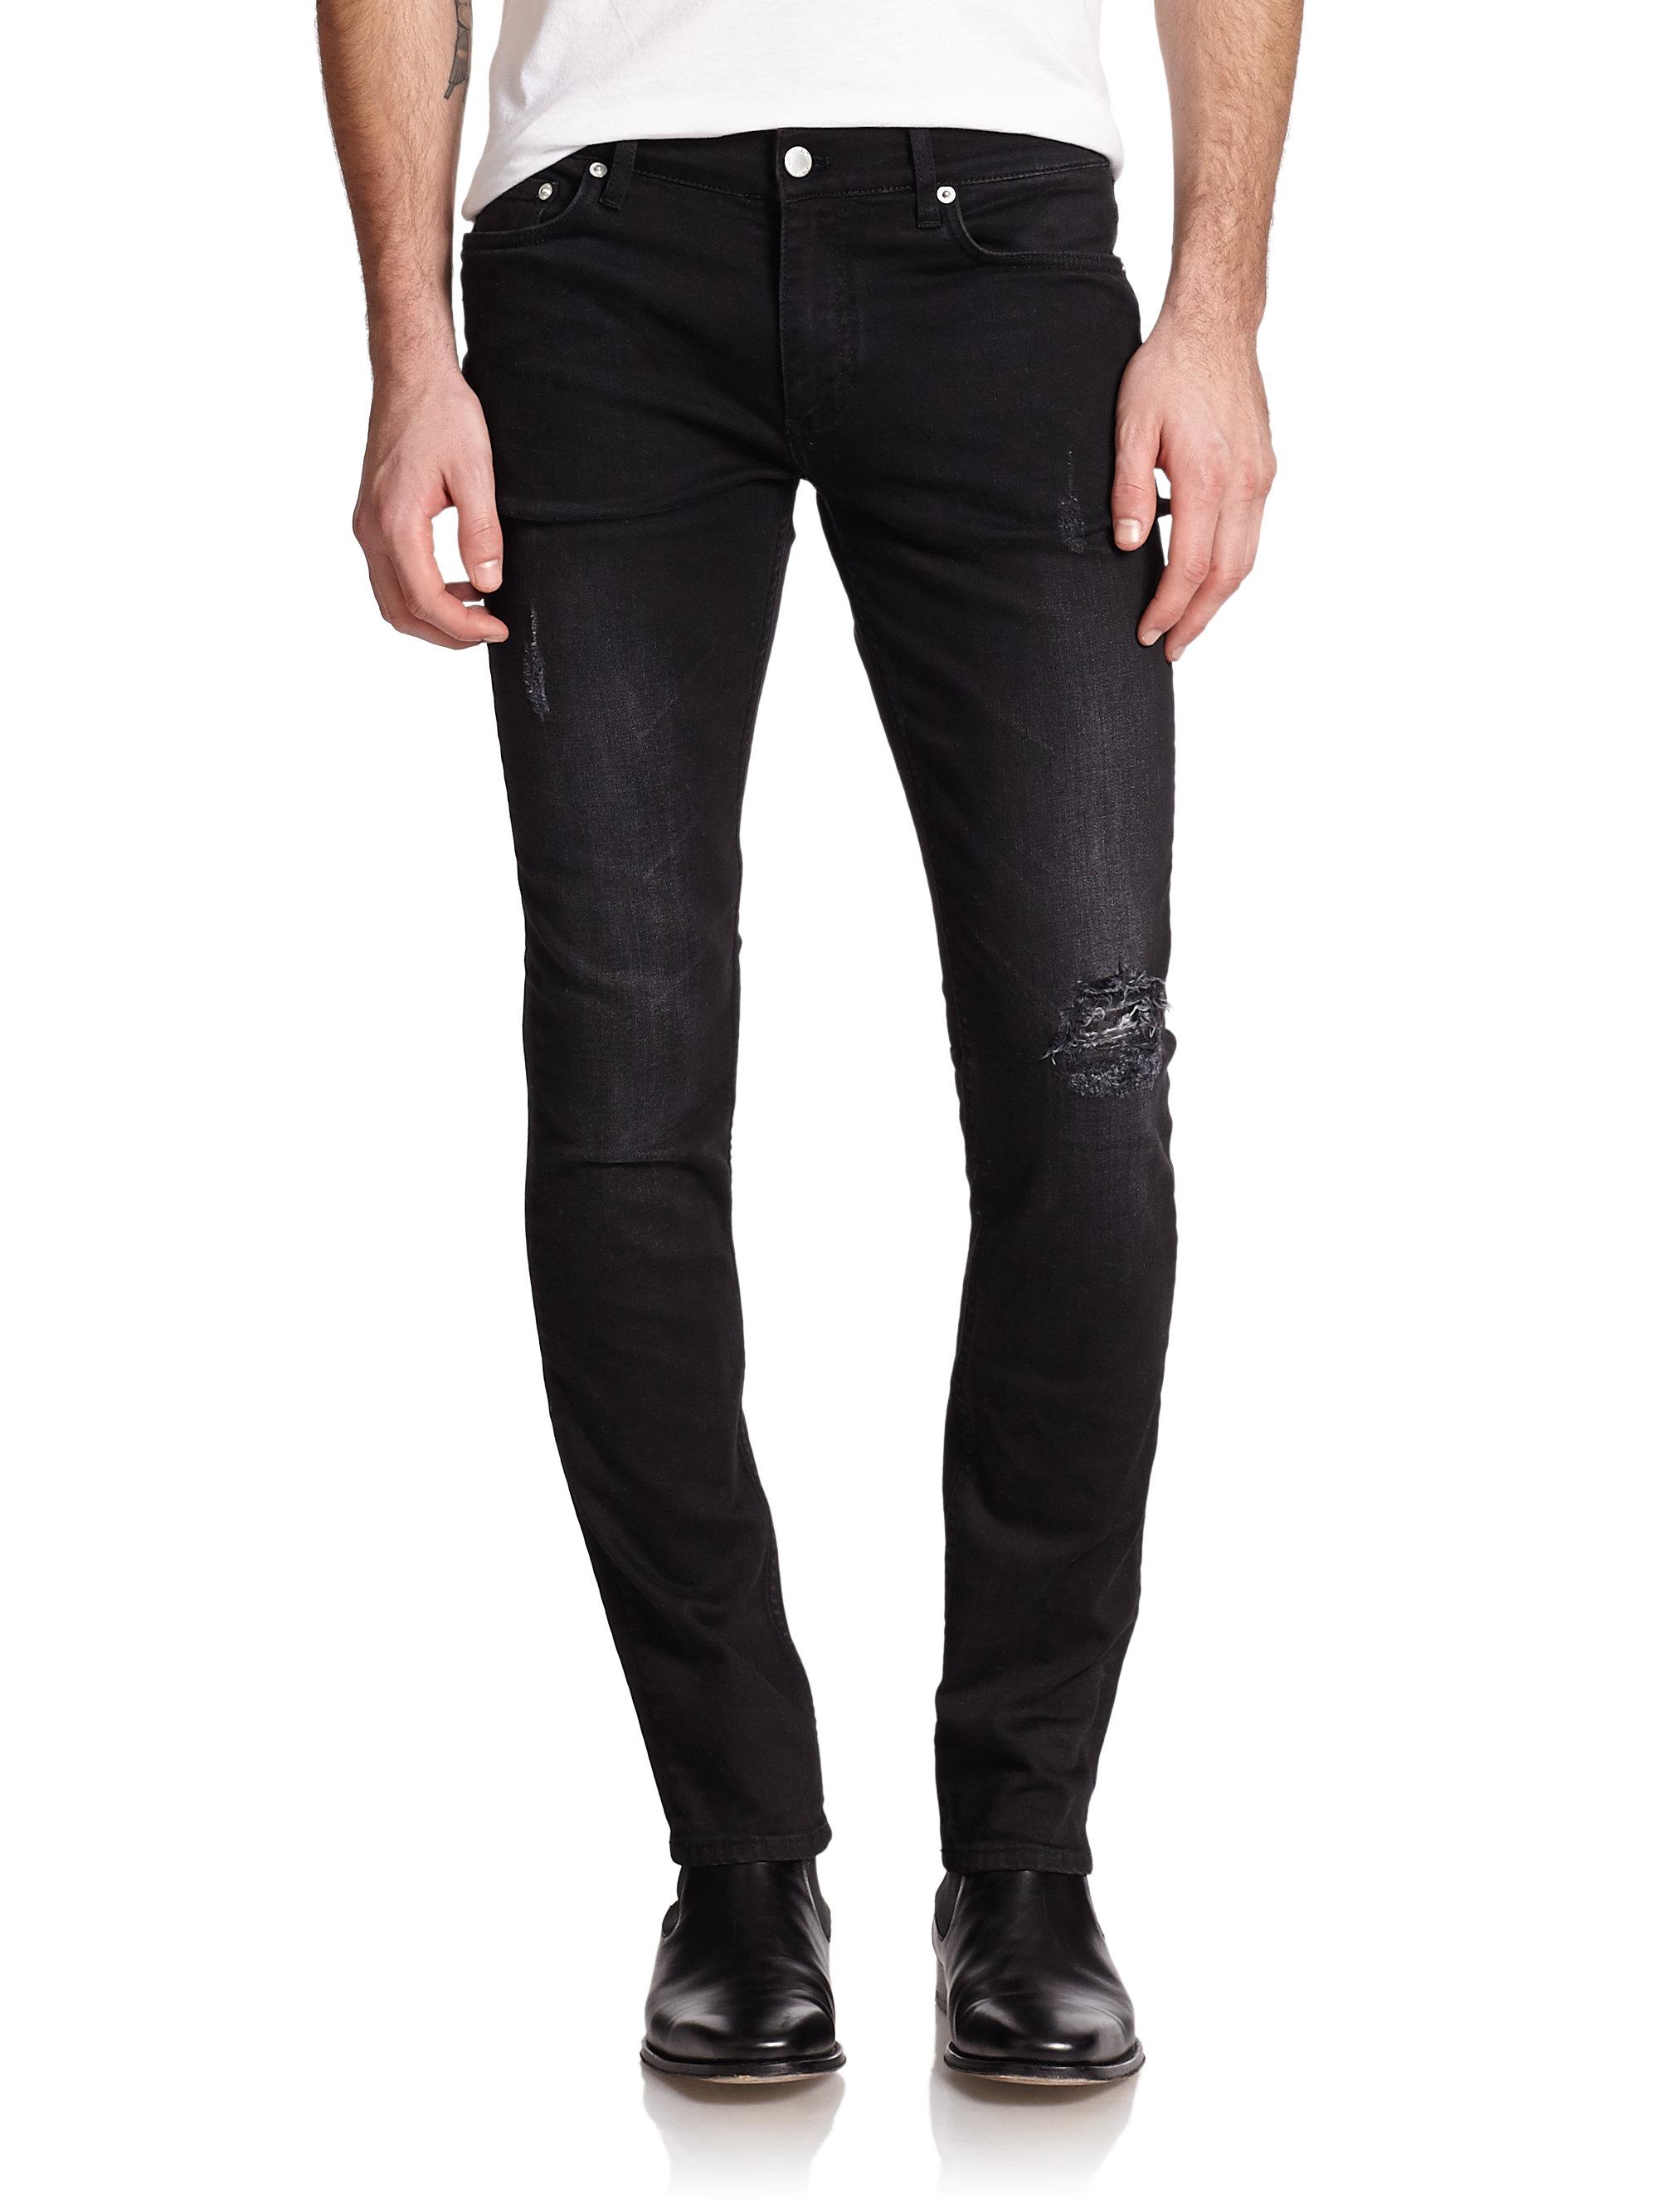 Dc Hbx Blk Dnm 25 Skinny Fit Jeans In Black For Men Lyst